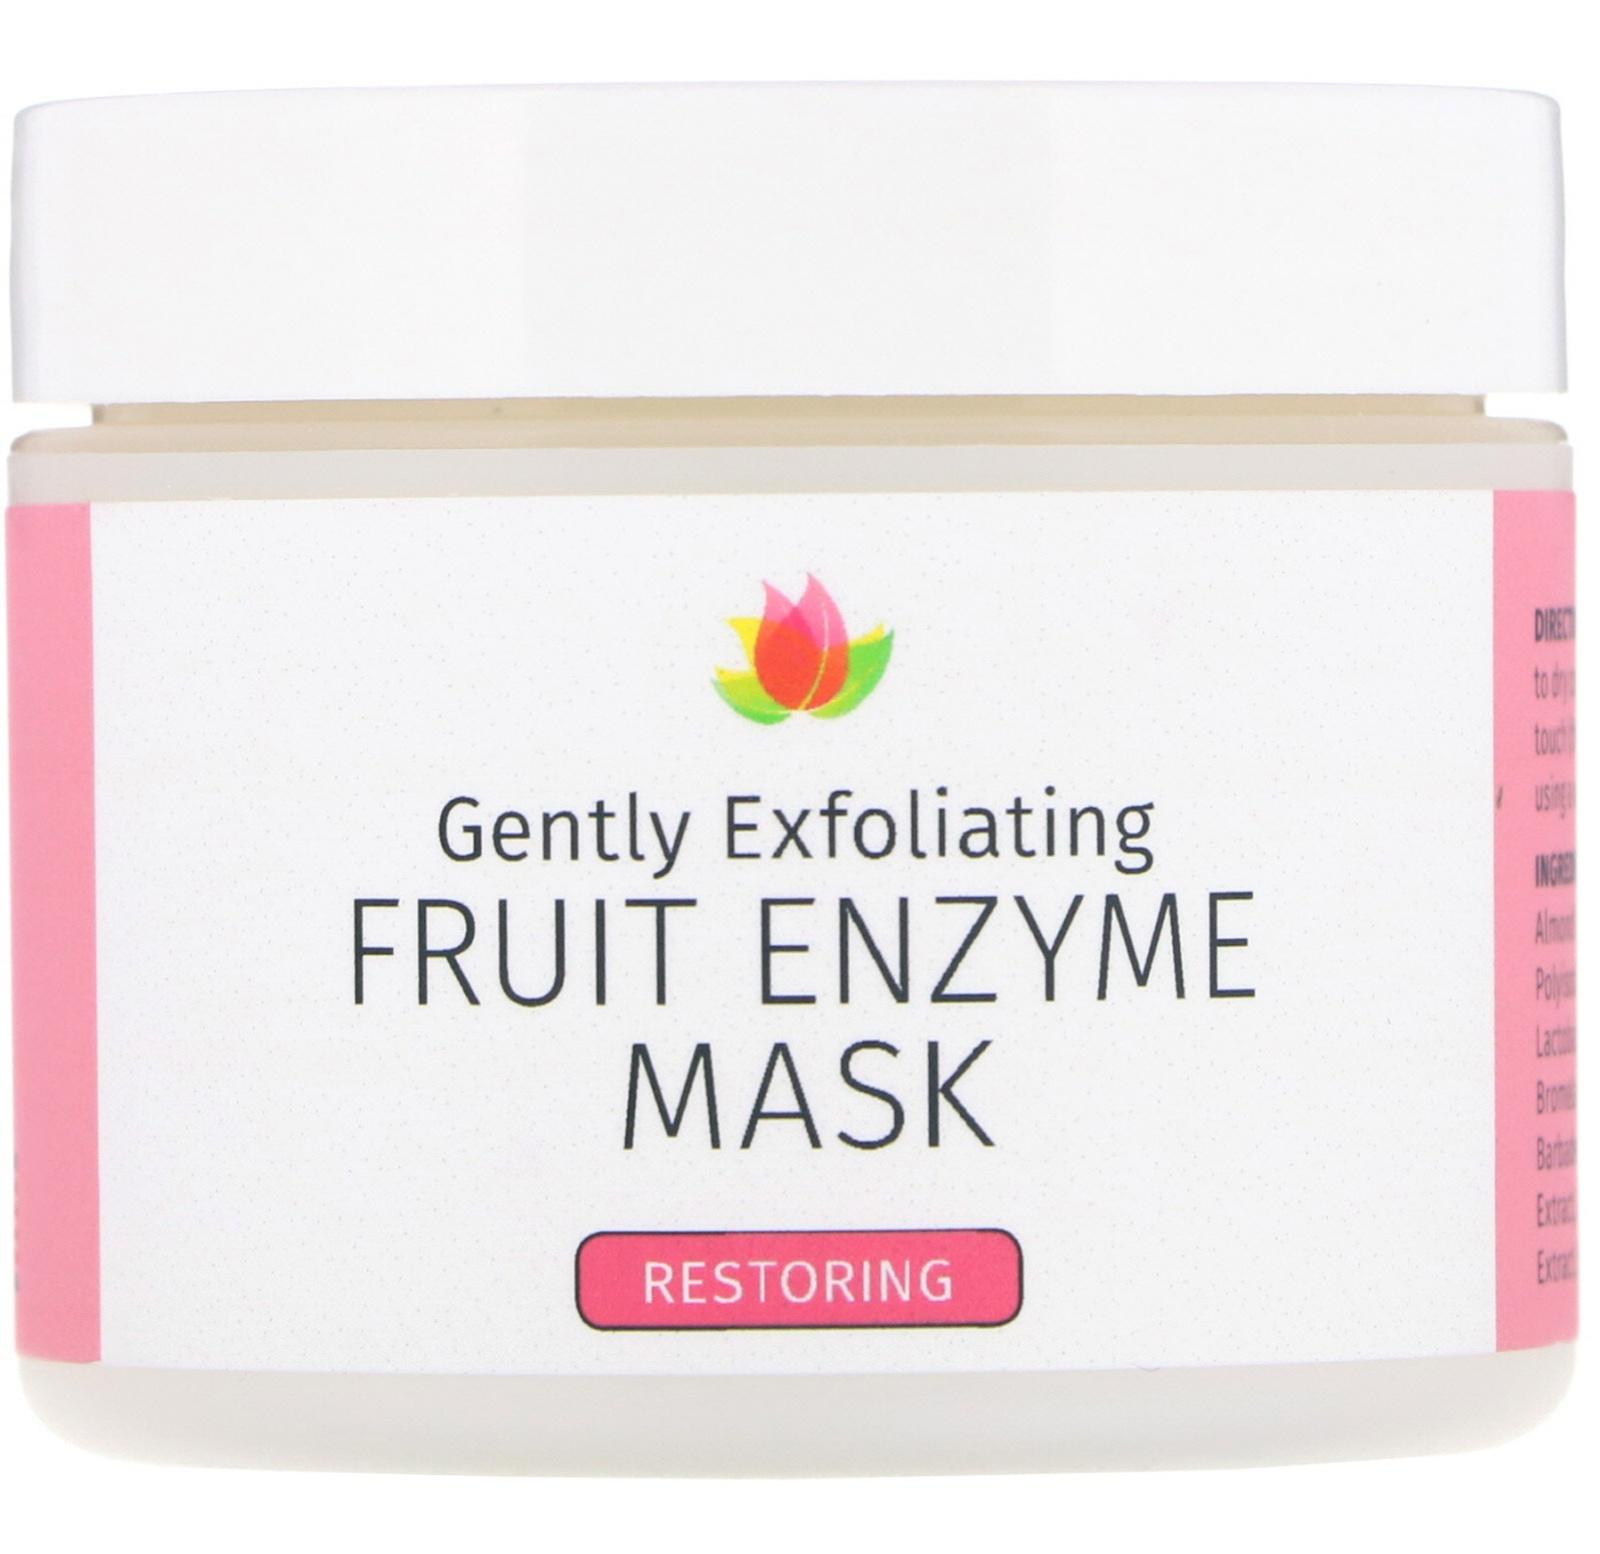 Reviva Labs Gently Exfoliating, Fruit Enzyme Mask